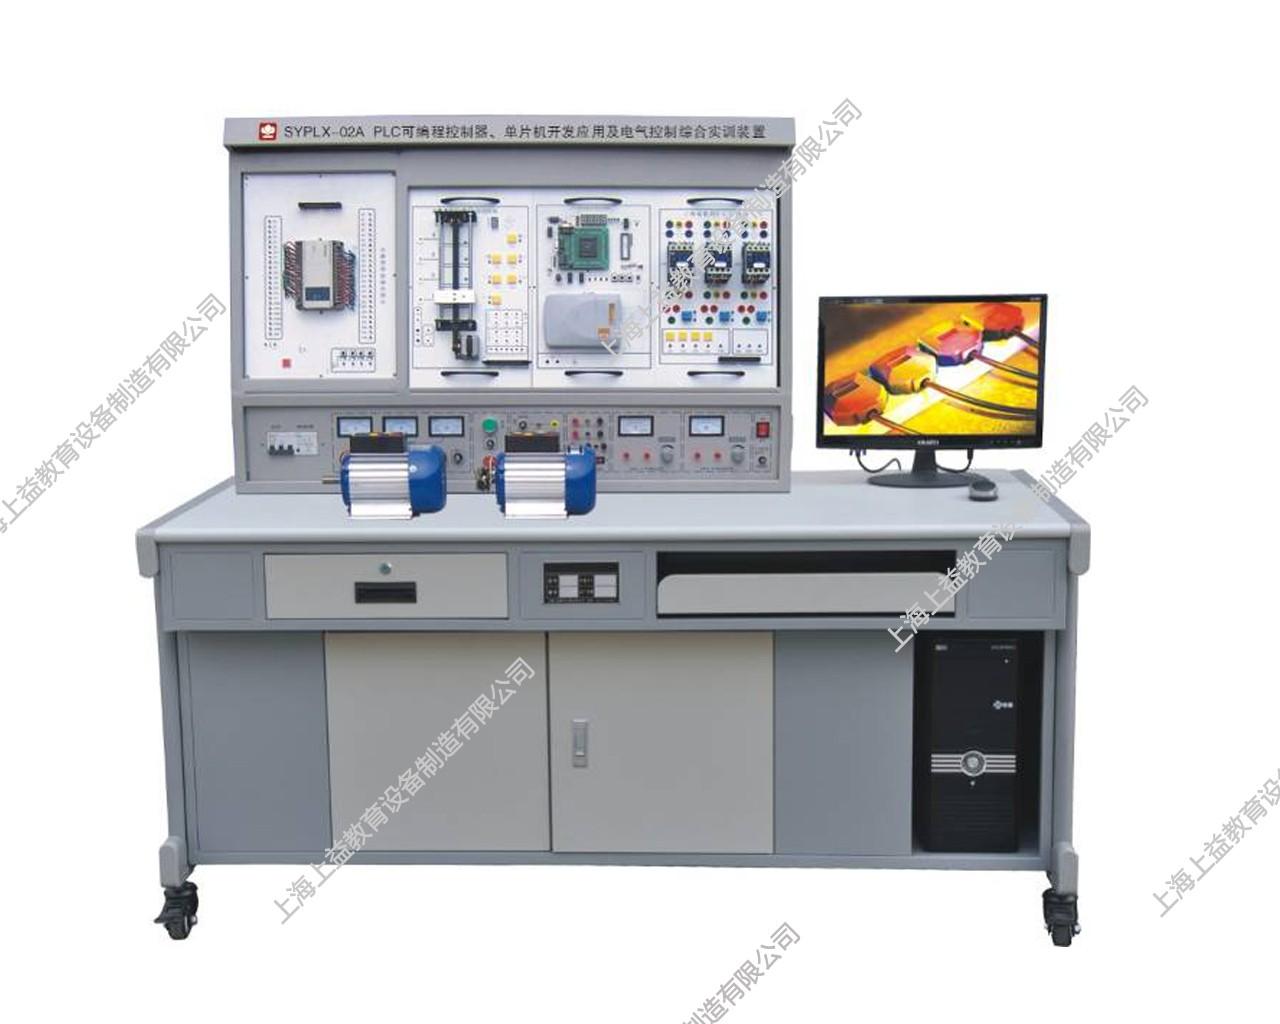 SYPLX-02APLC可编程控制器、单片机开发应用及电气控制综合wwwlehu8vip装置